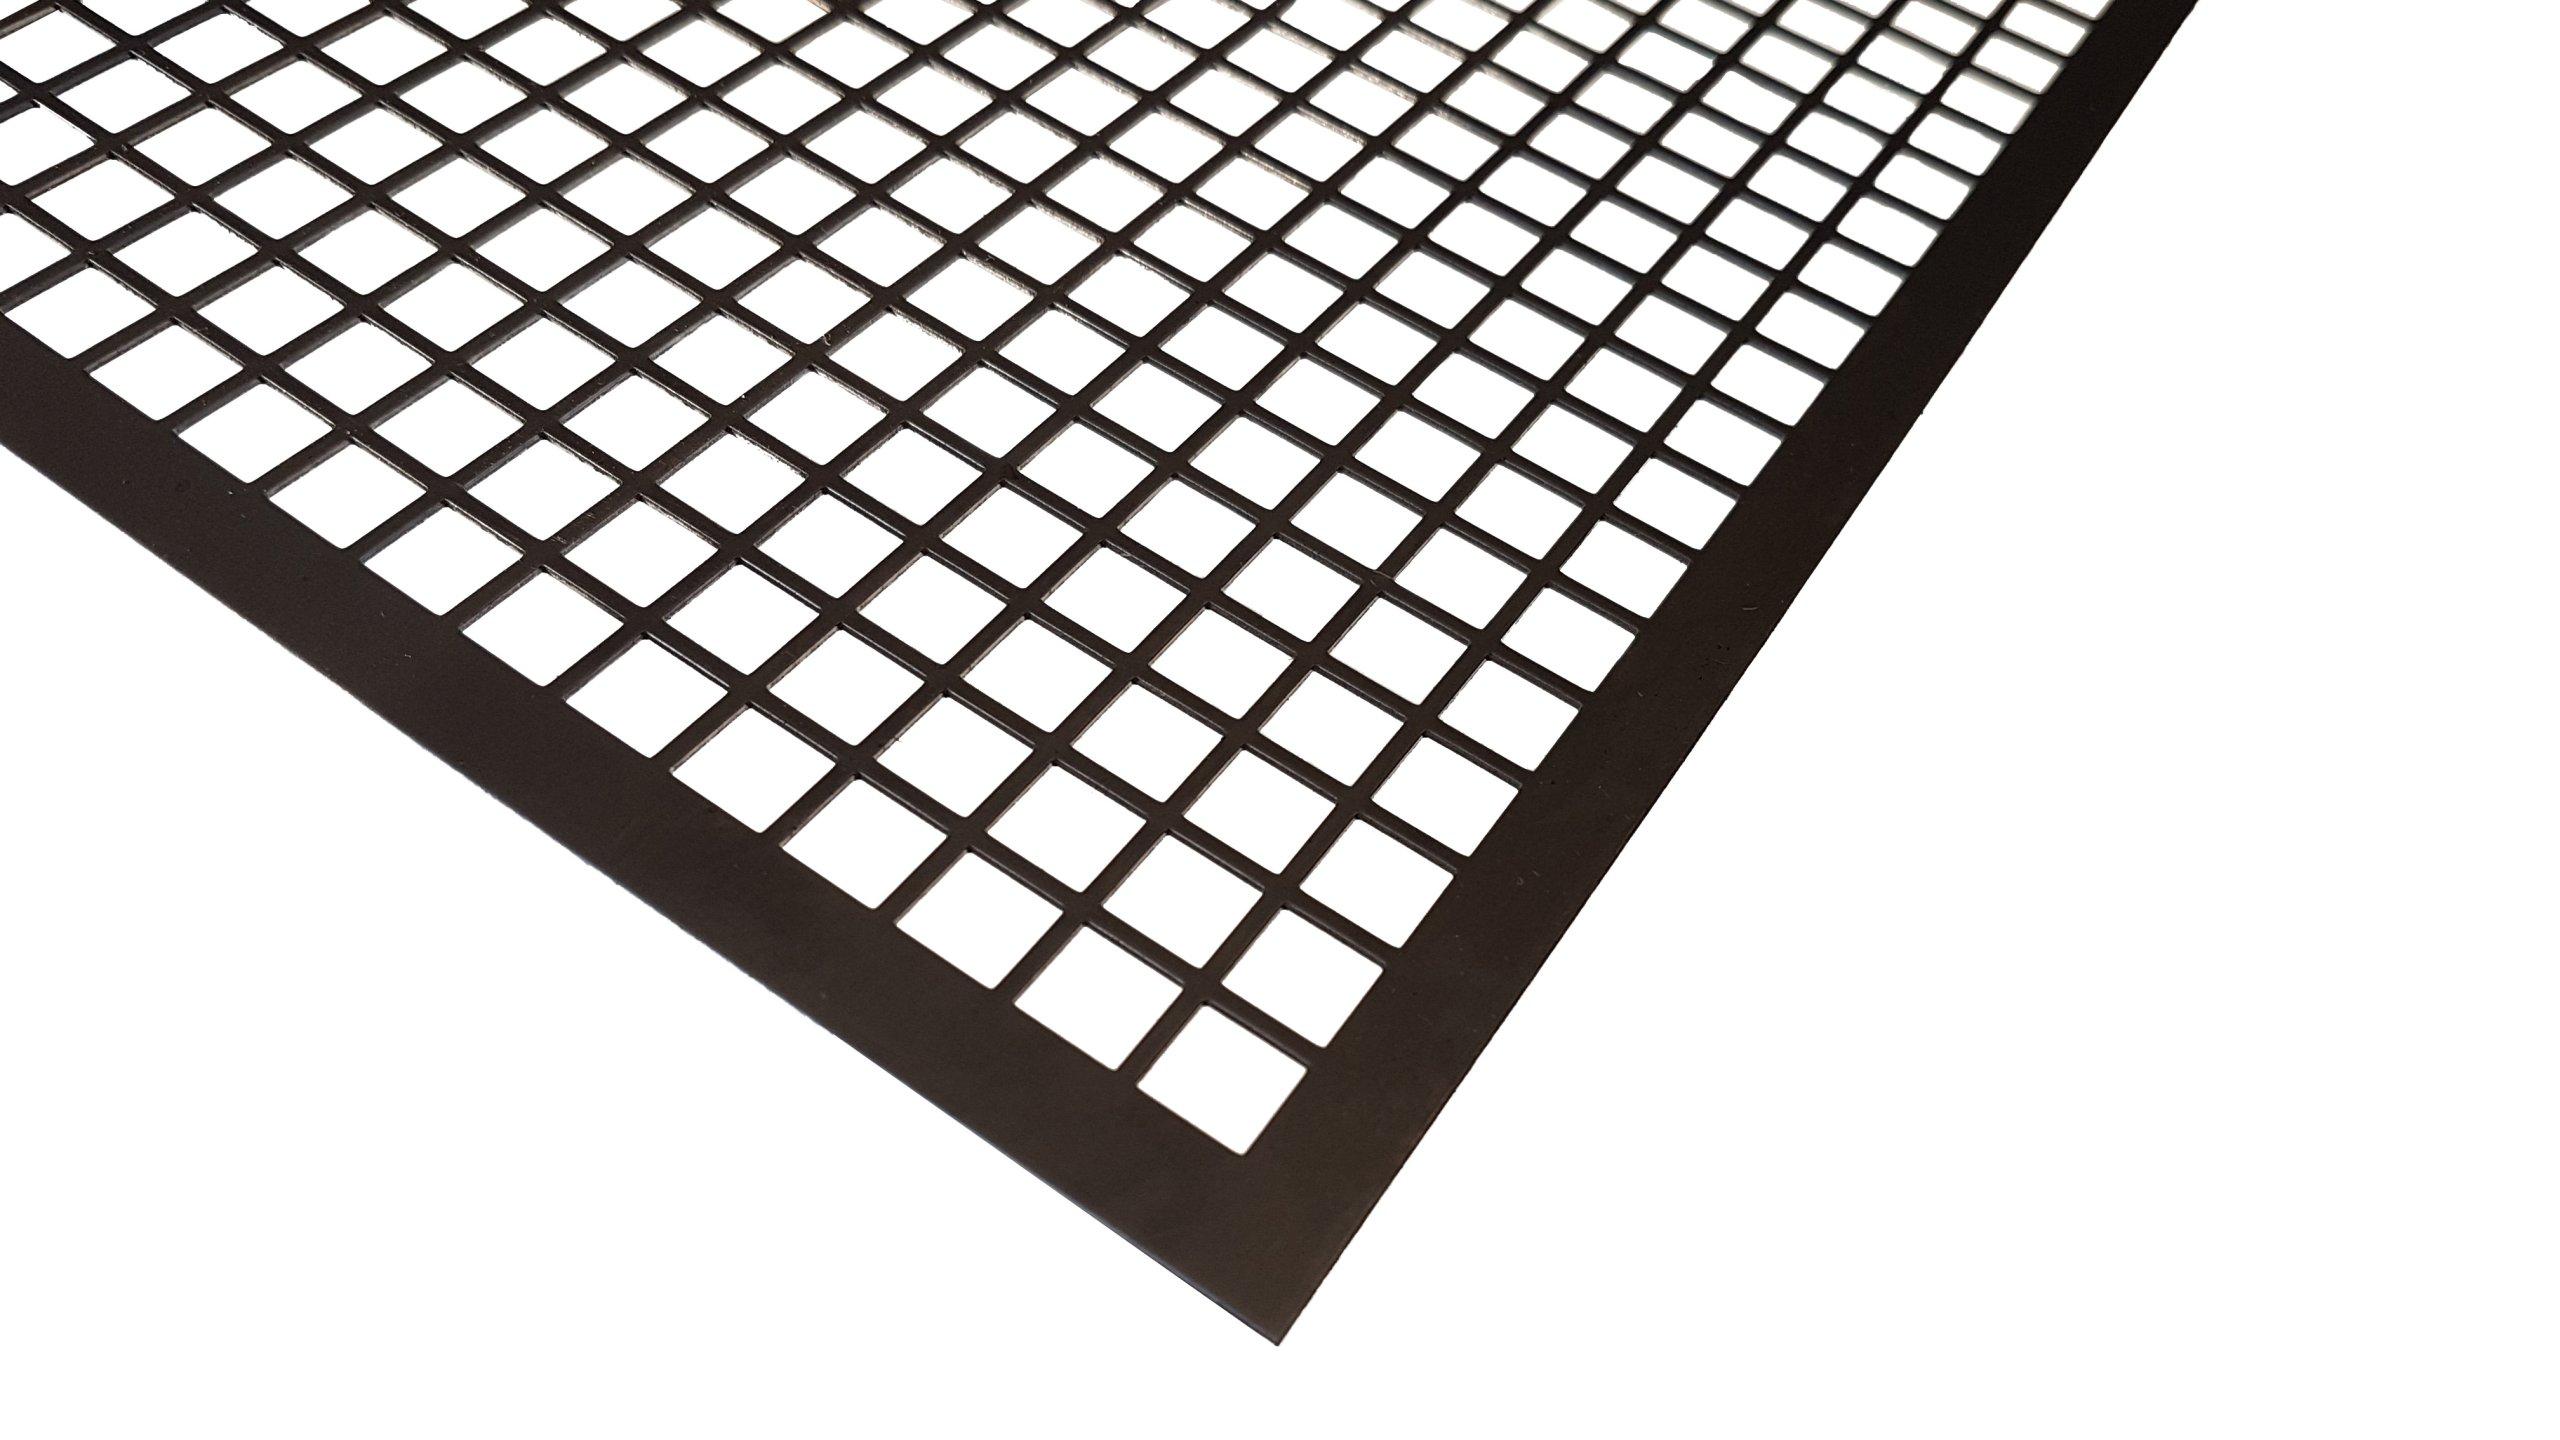 BLACHA PERFOROWANA 1000 x 2000 1 mm 10-12 czarna